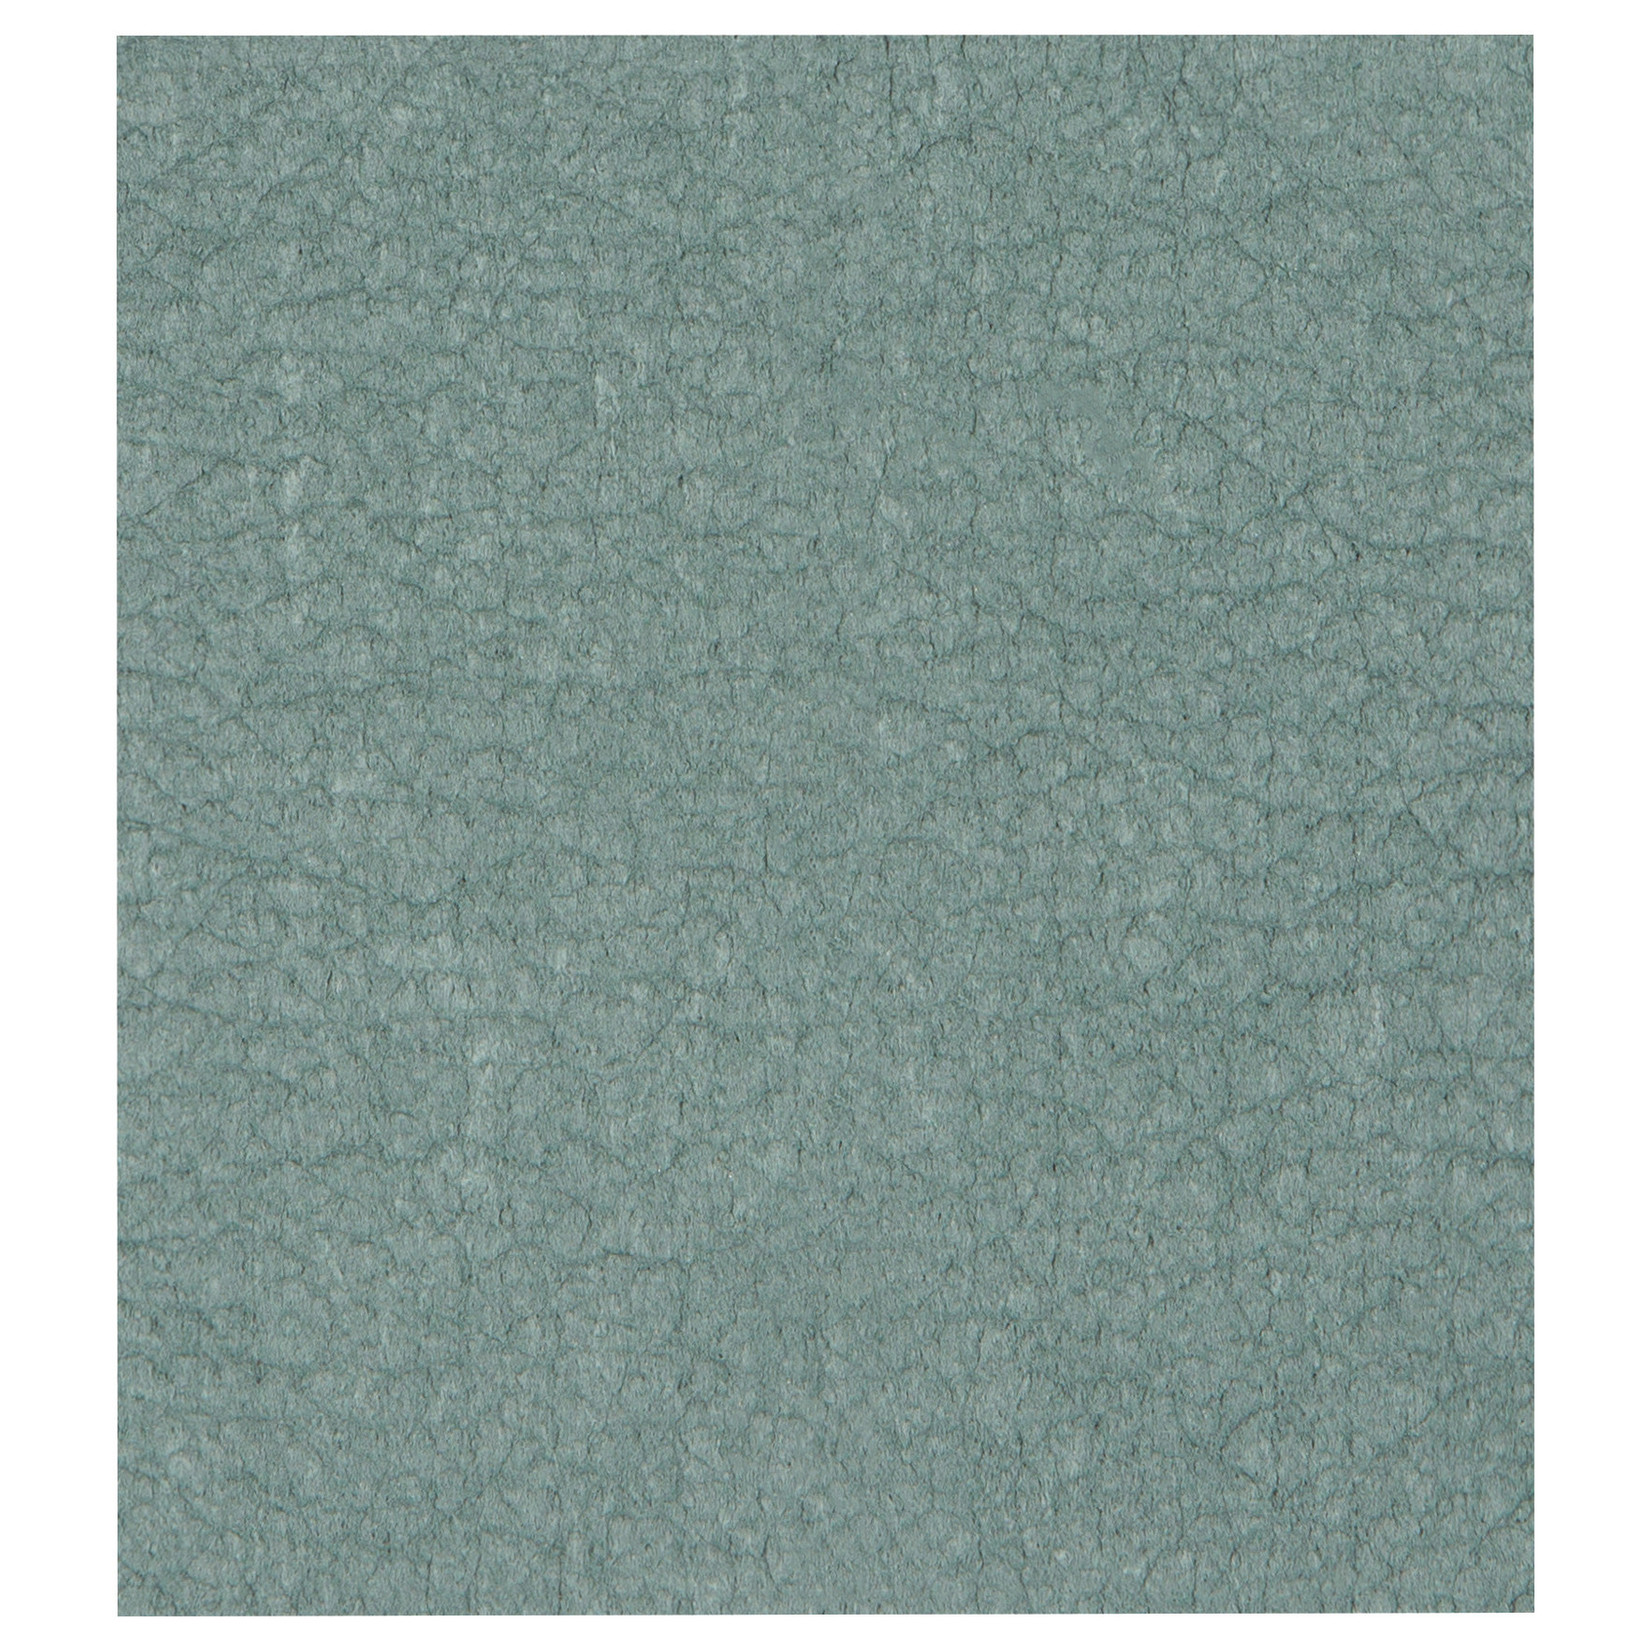 Swedish Dishcloths - Heirloom Collection